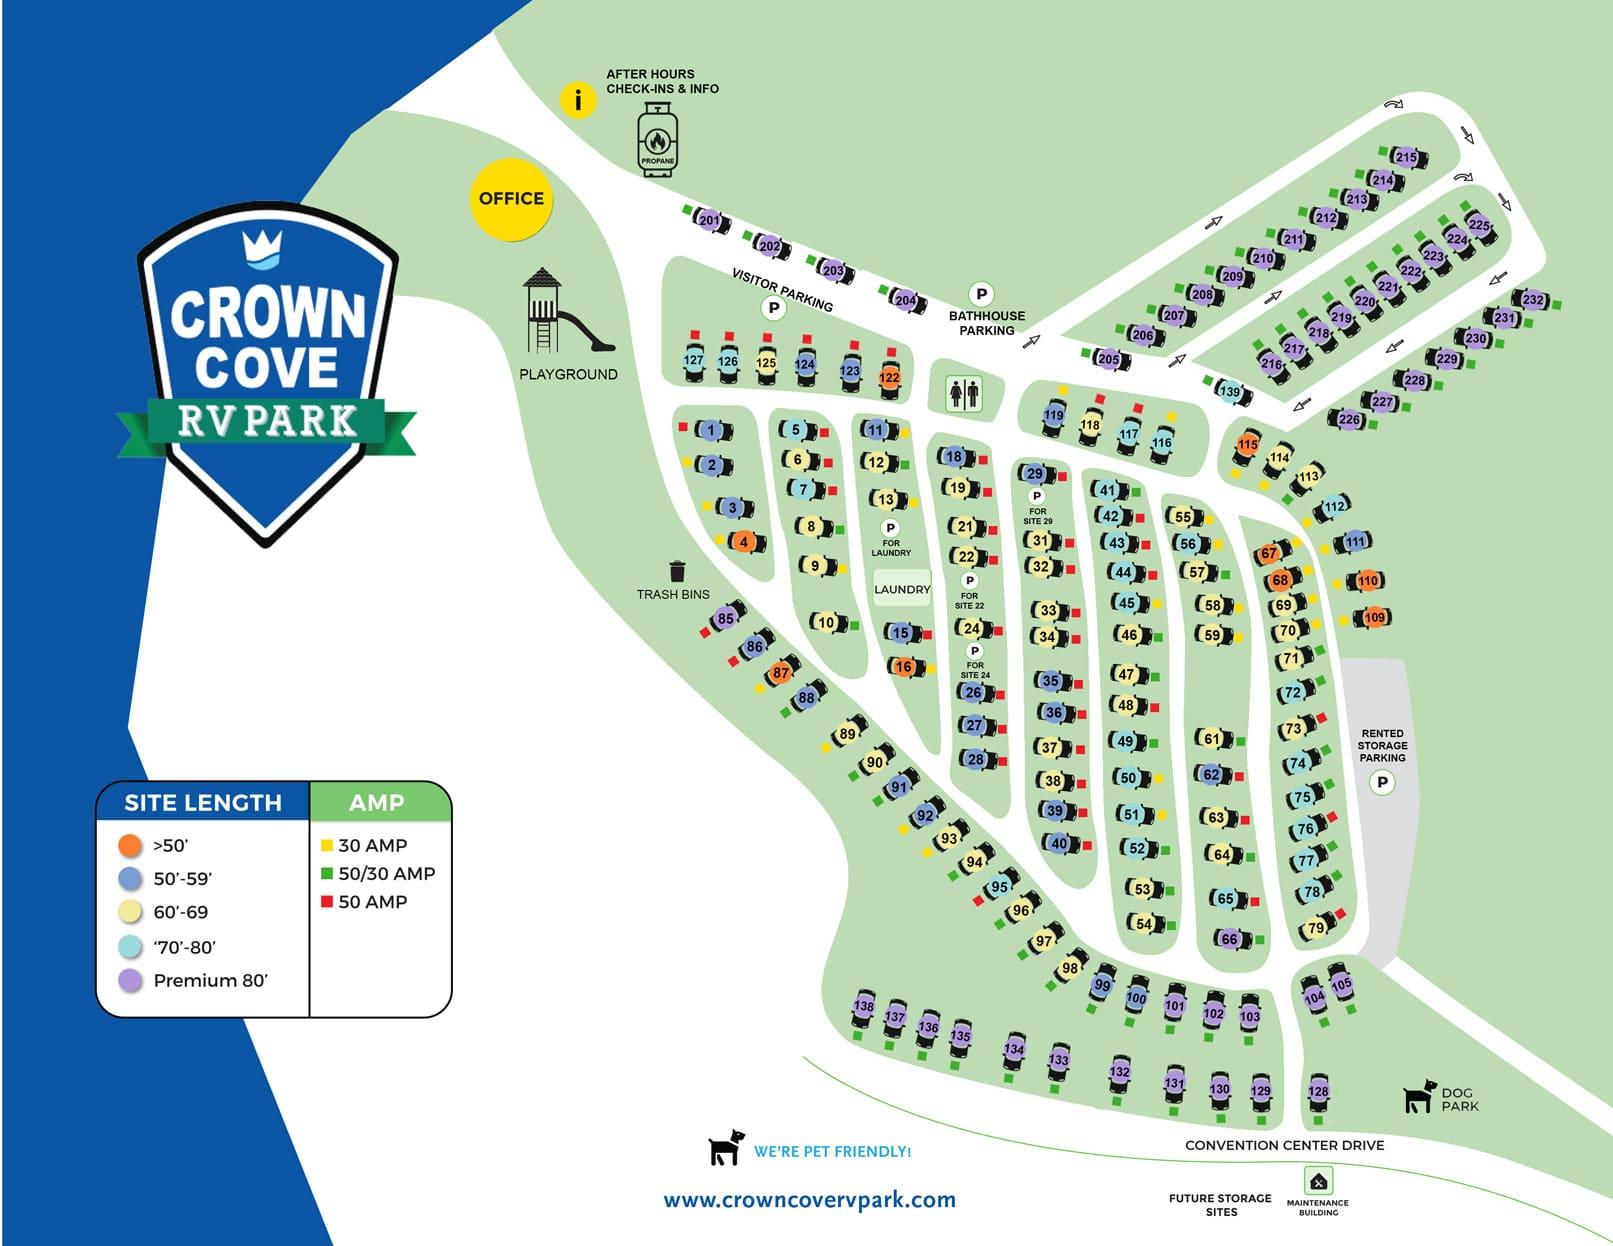 Crown Cove RV Park map